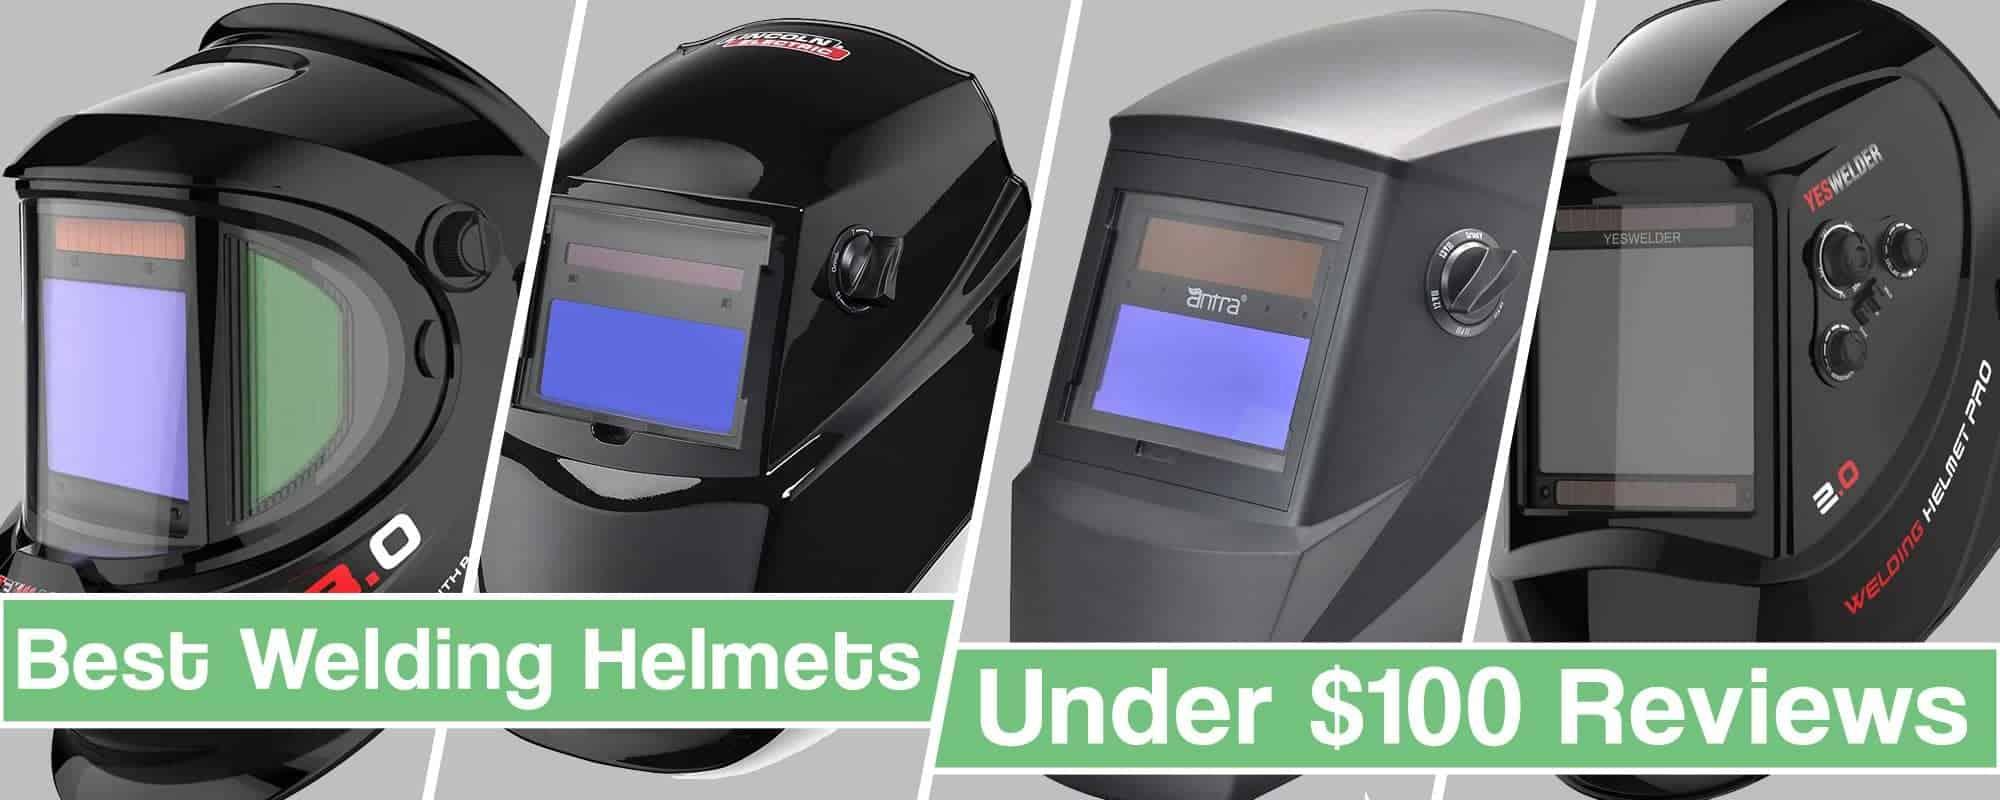 Featured image for the article Best welding helmet under 100 usd